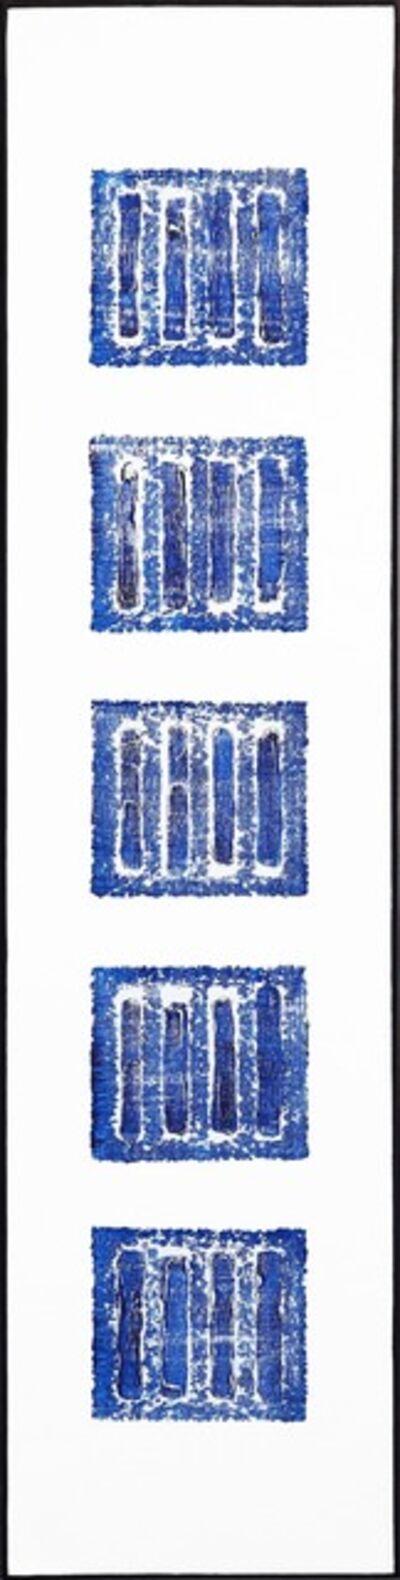 Len Klikunas, 'Five Moments (Incline, Yosemite - Blue)', 2020